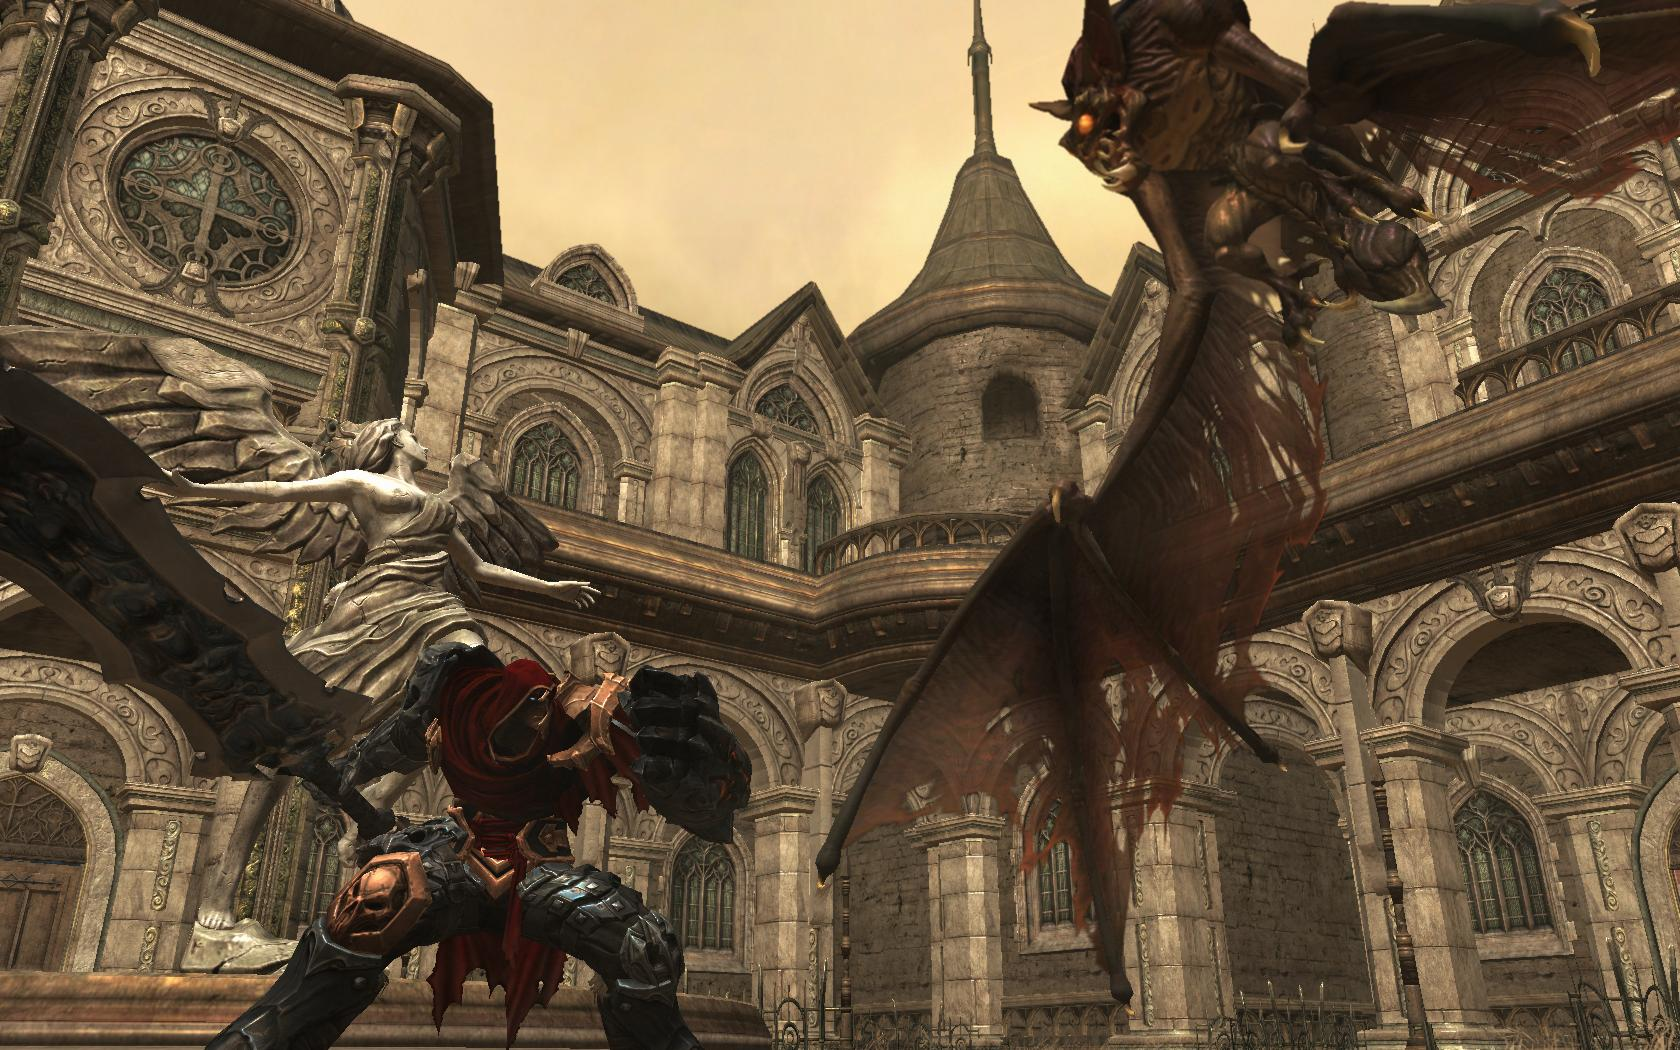 Darksiders screenshot